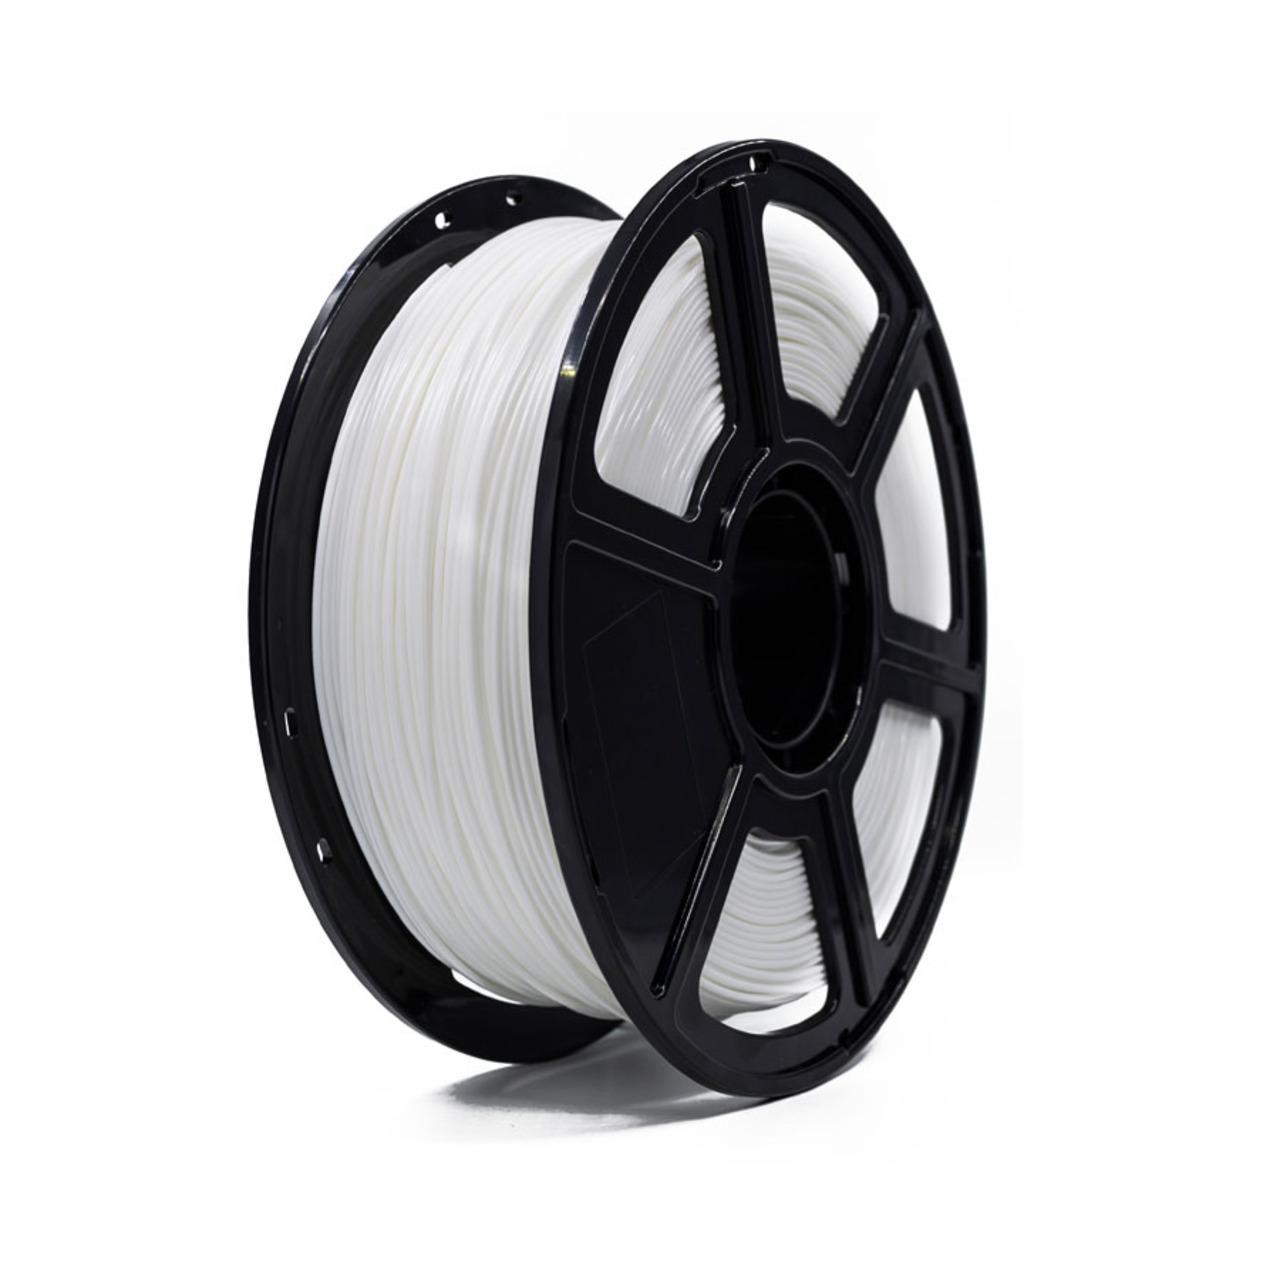 Flashforge PETG-Filament- weiss- 1-75 mm- 1 kg